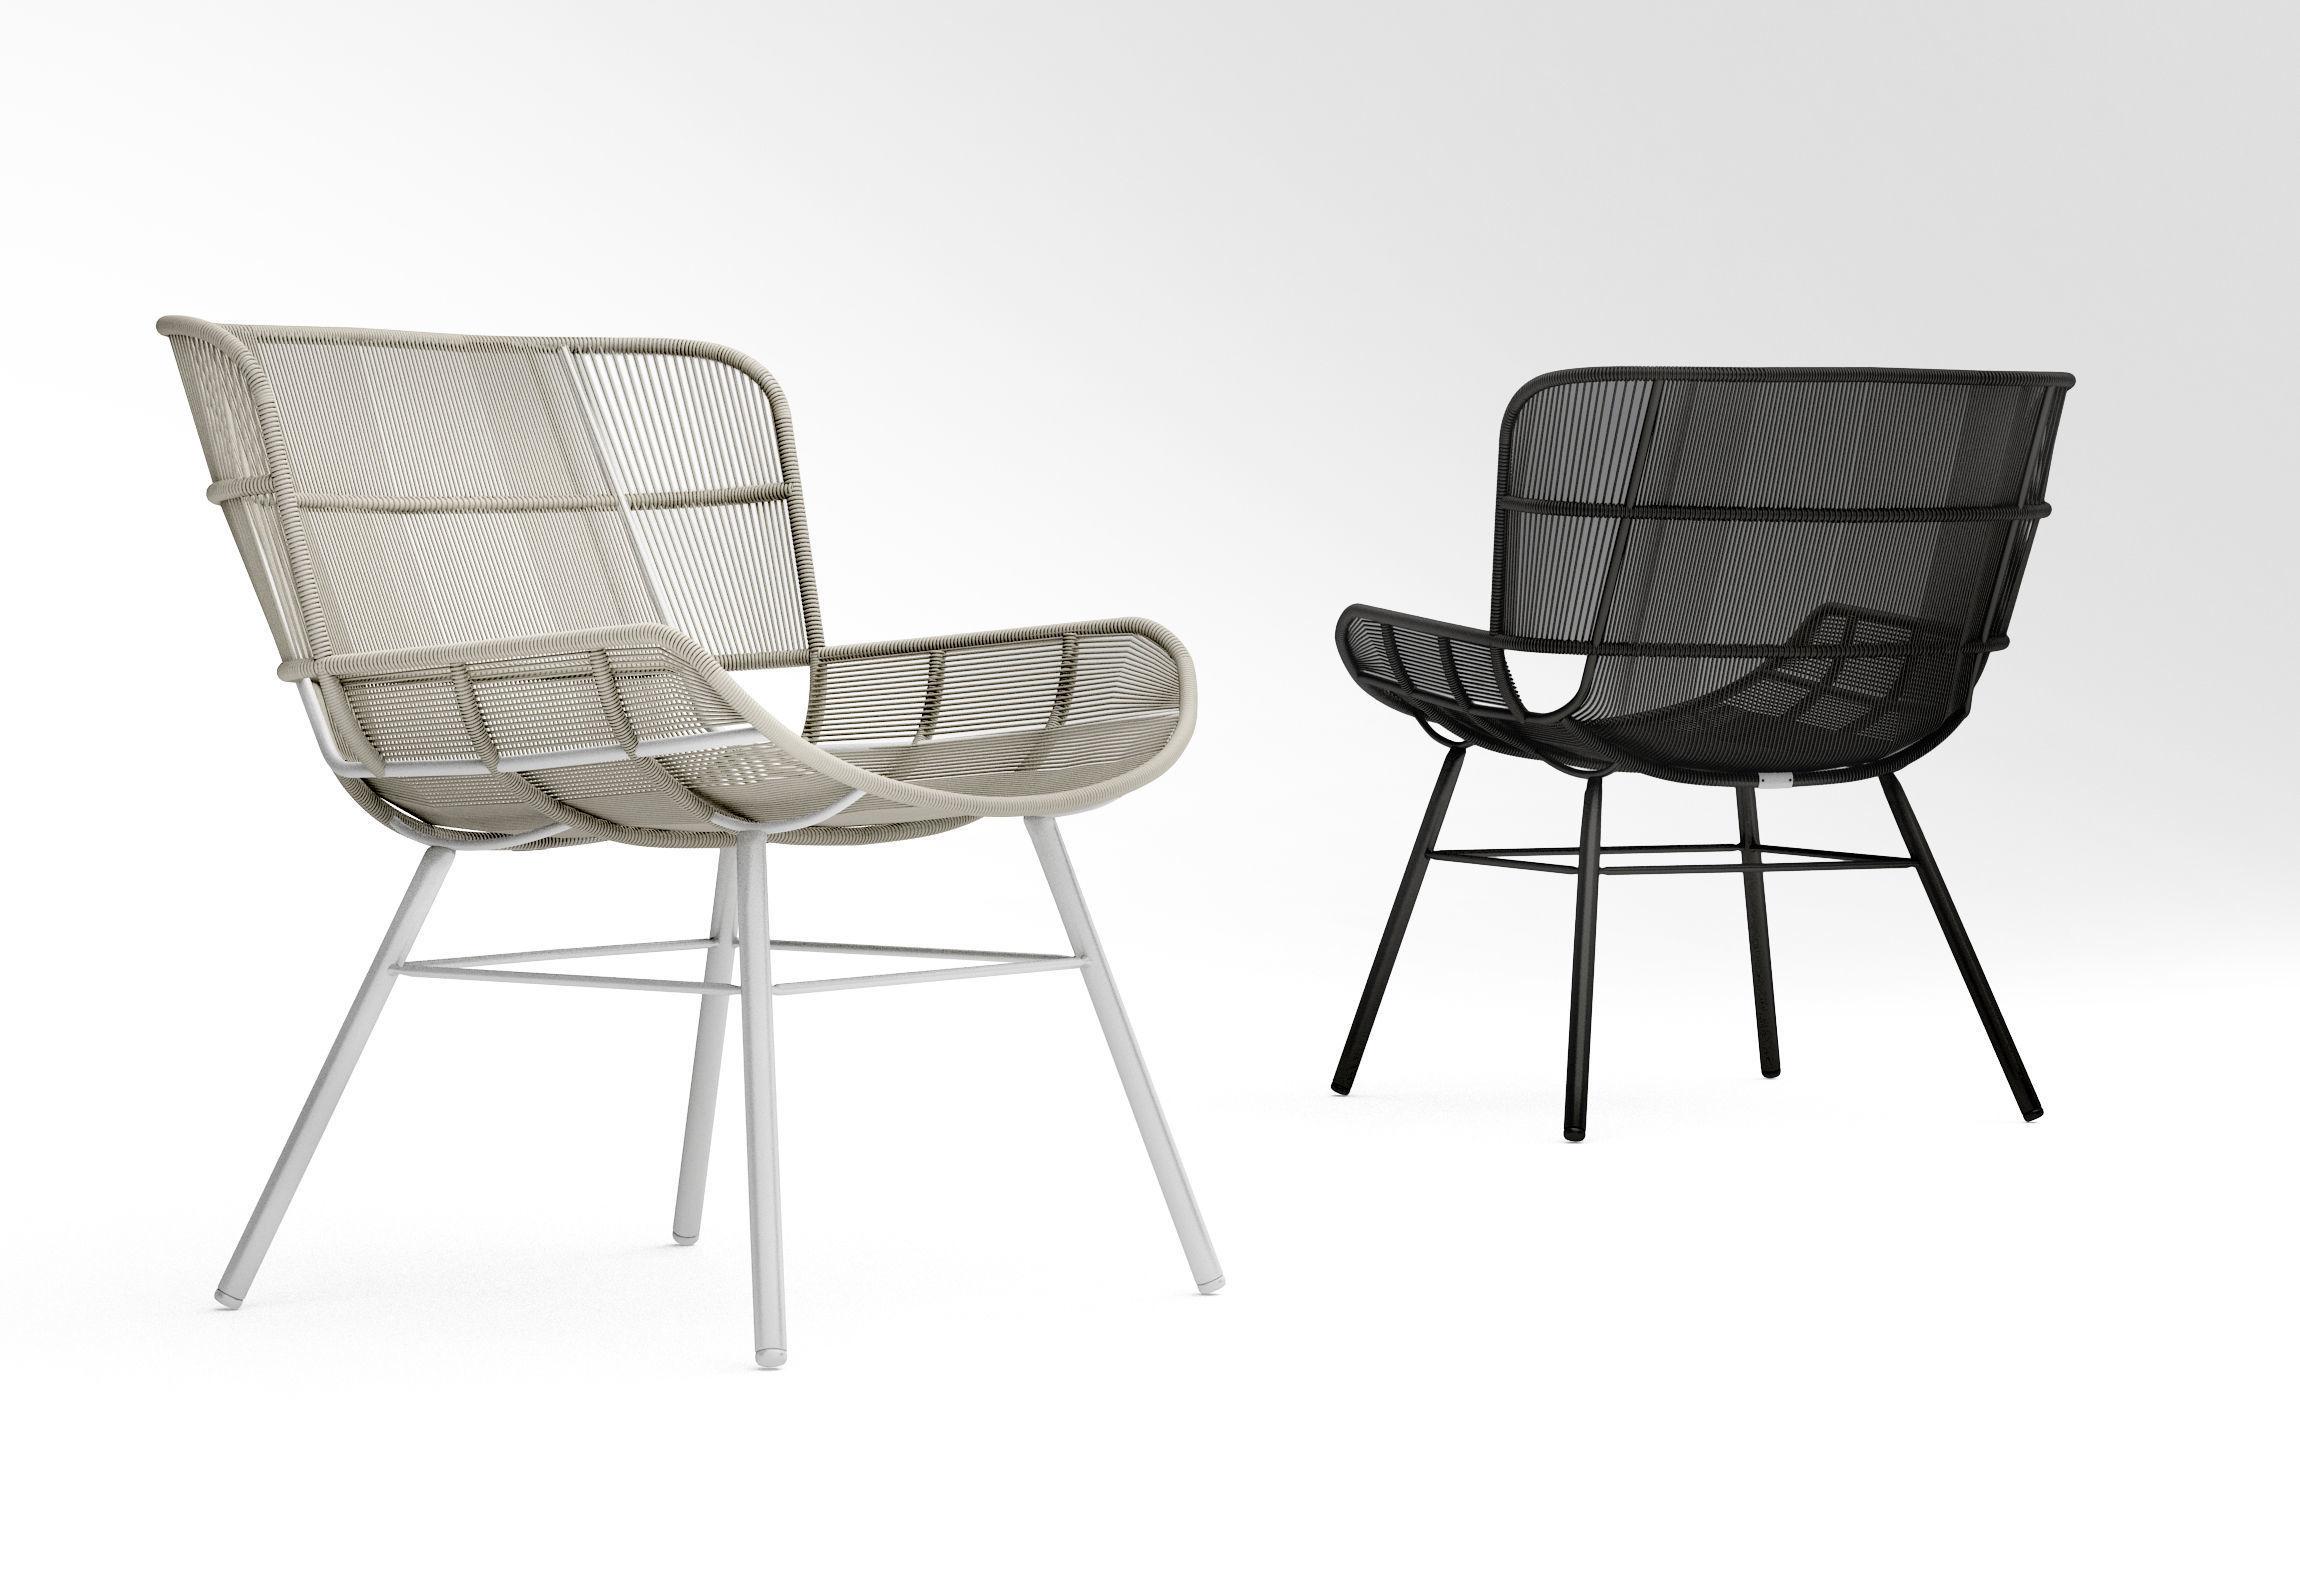 Coco Republic Amalfi outdoor lounge chair